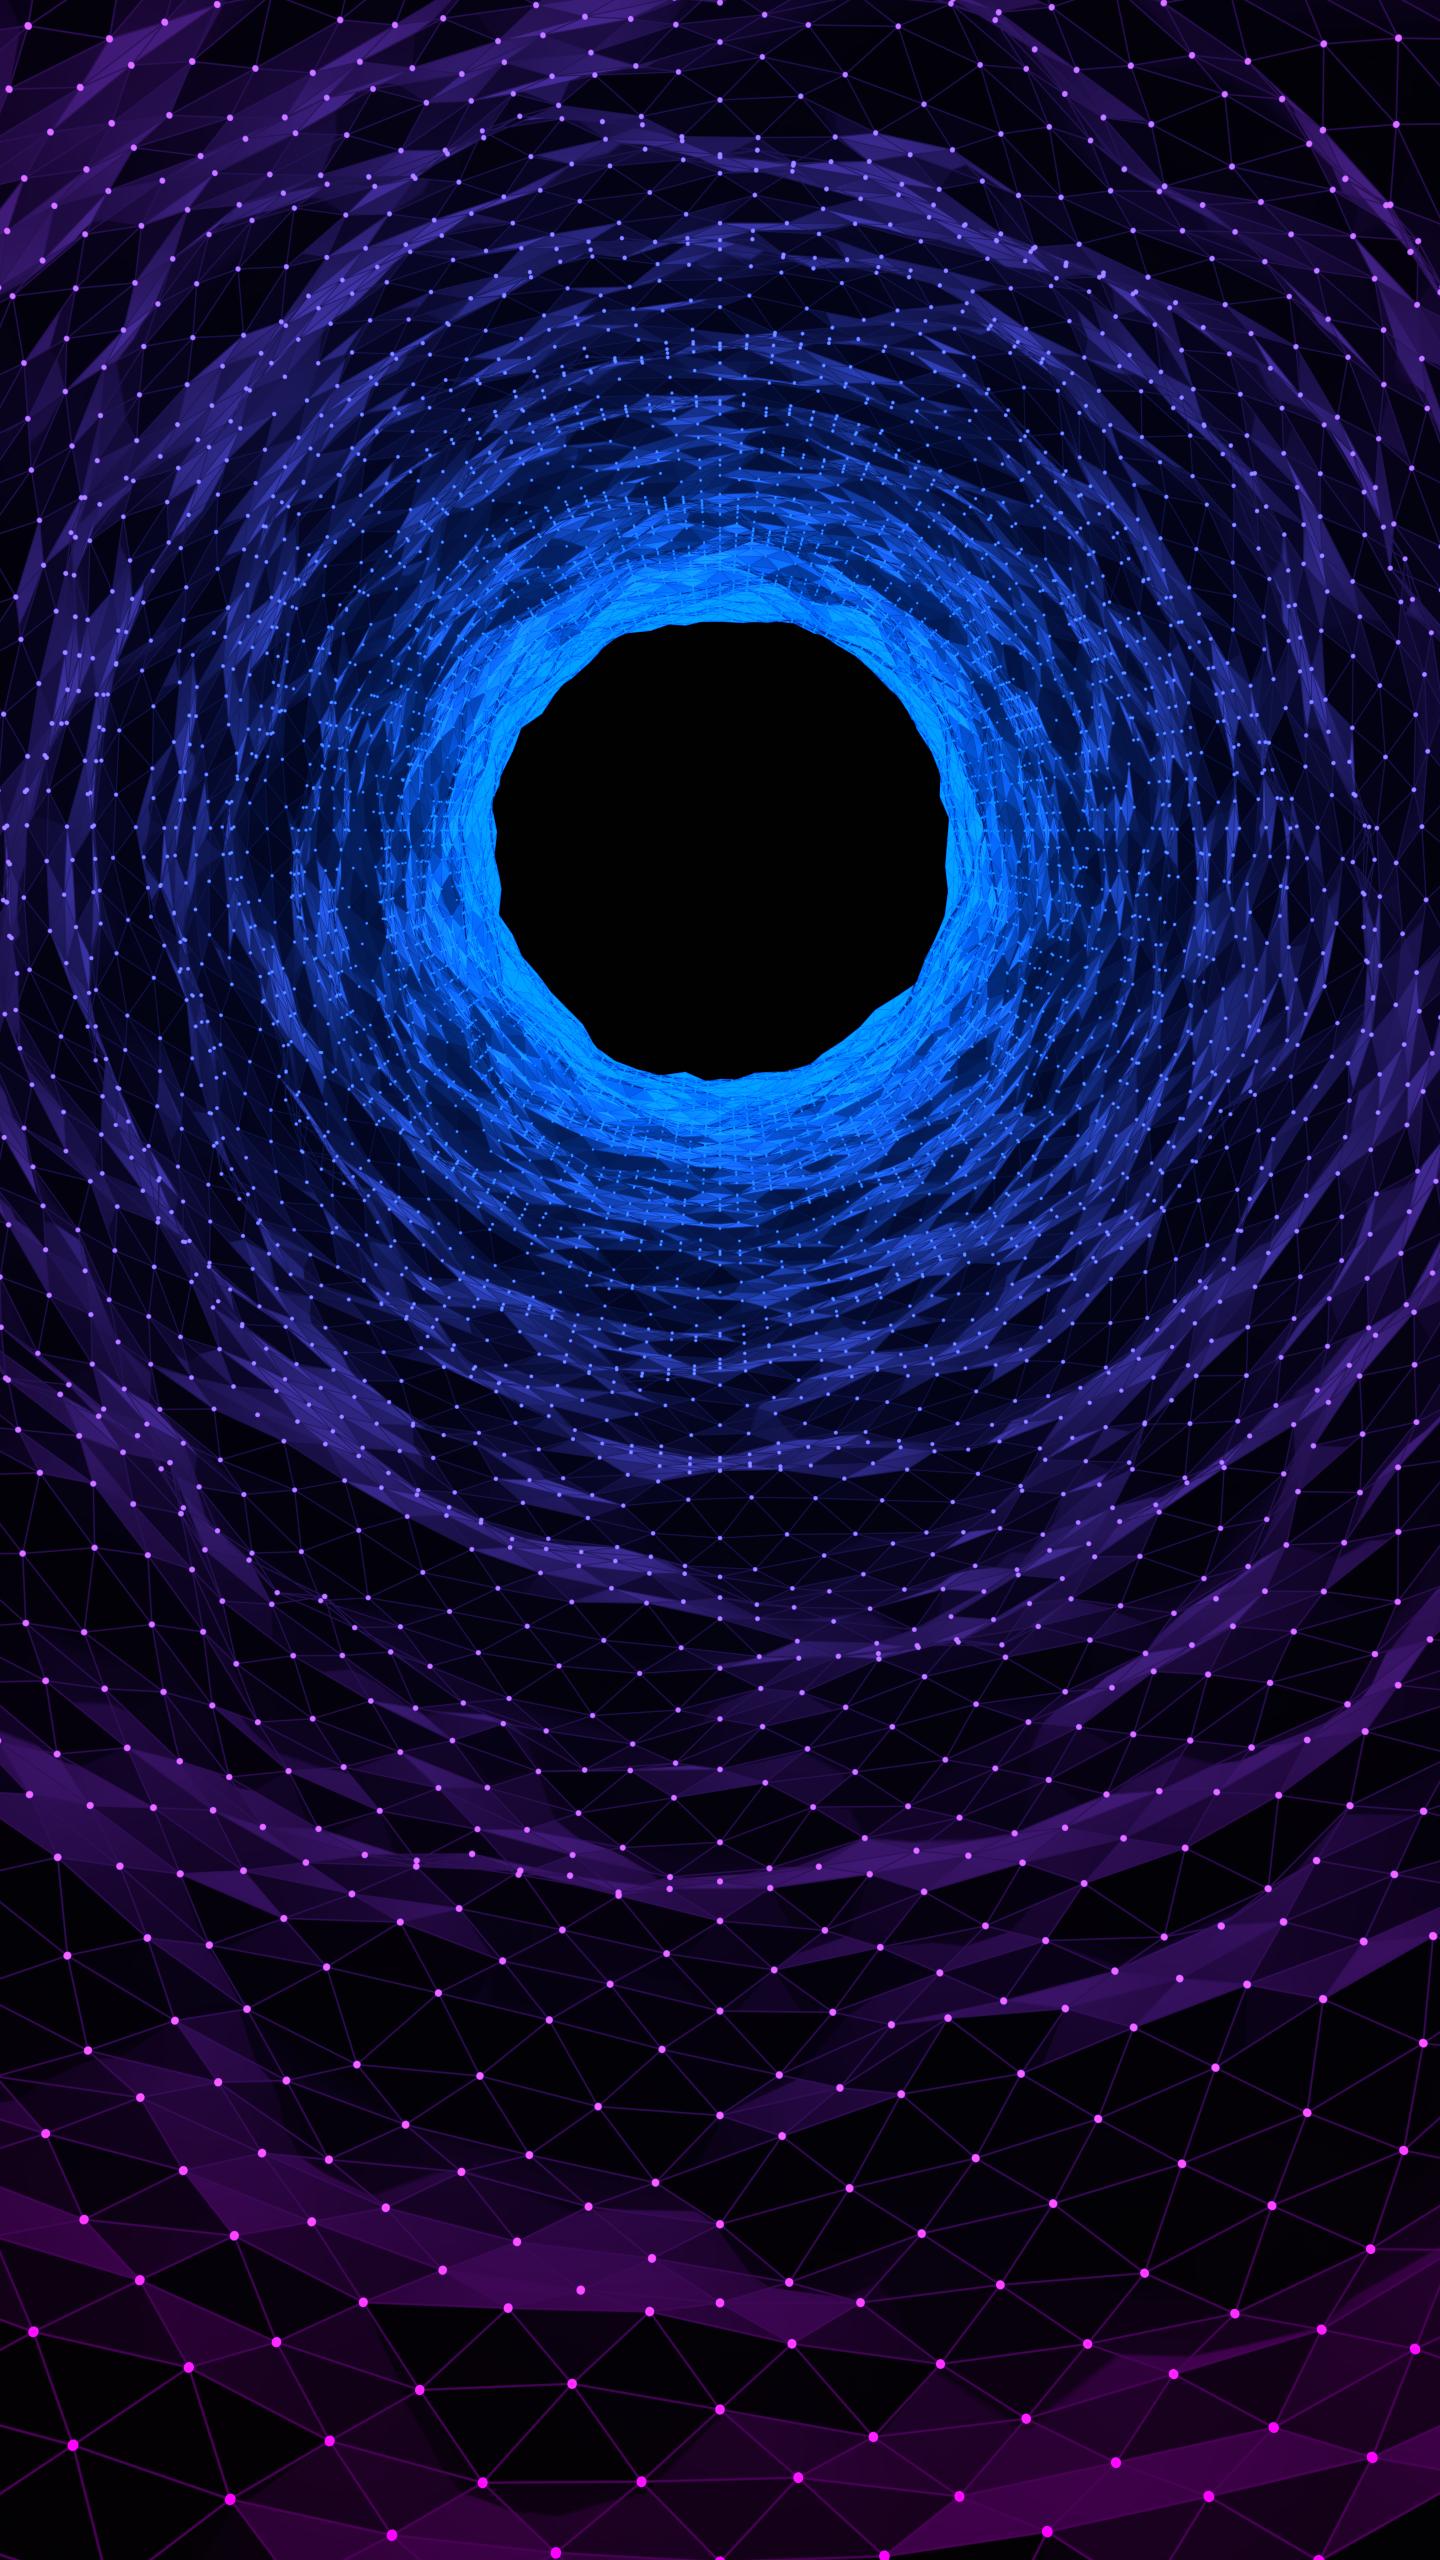 Void [1440x2560] Phone wallpaper, Wallpaper diy crafts